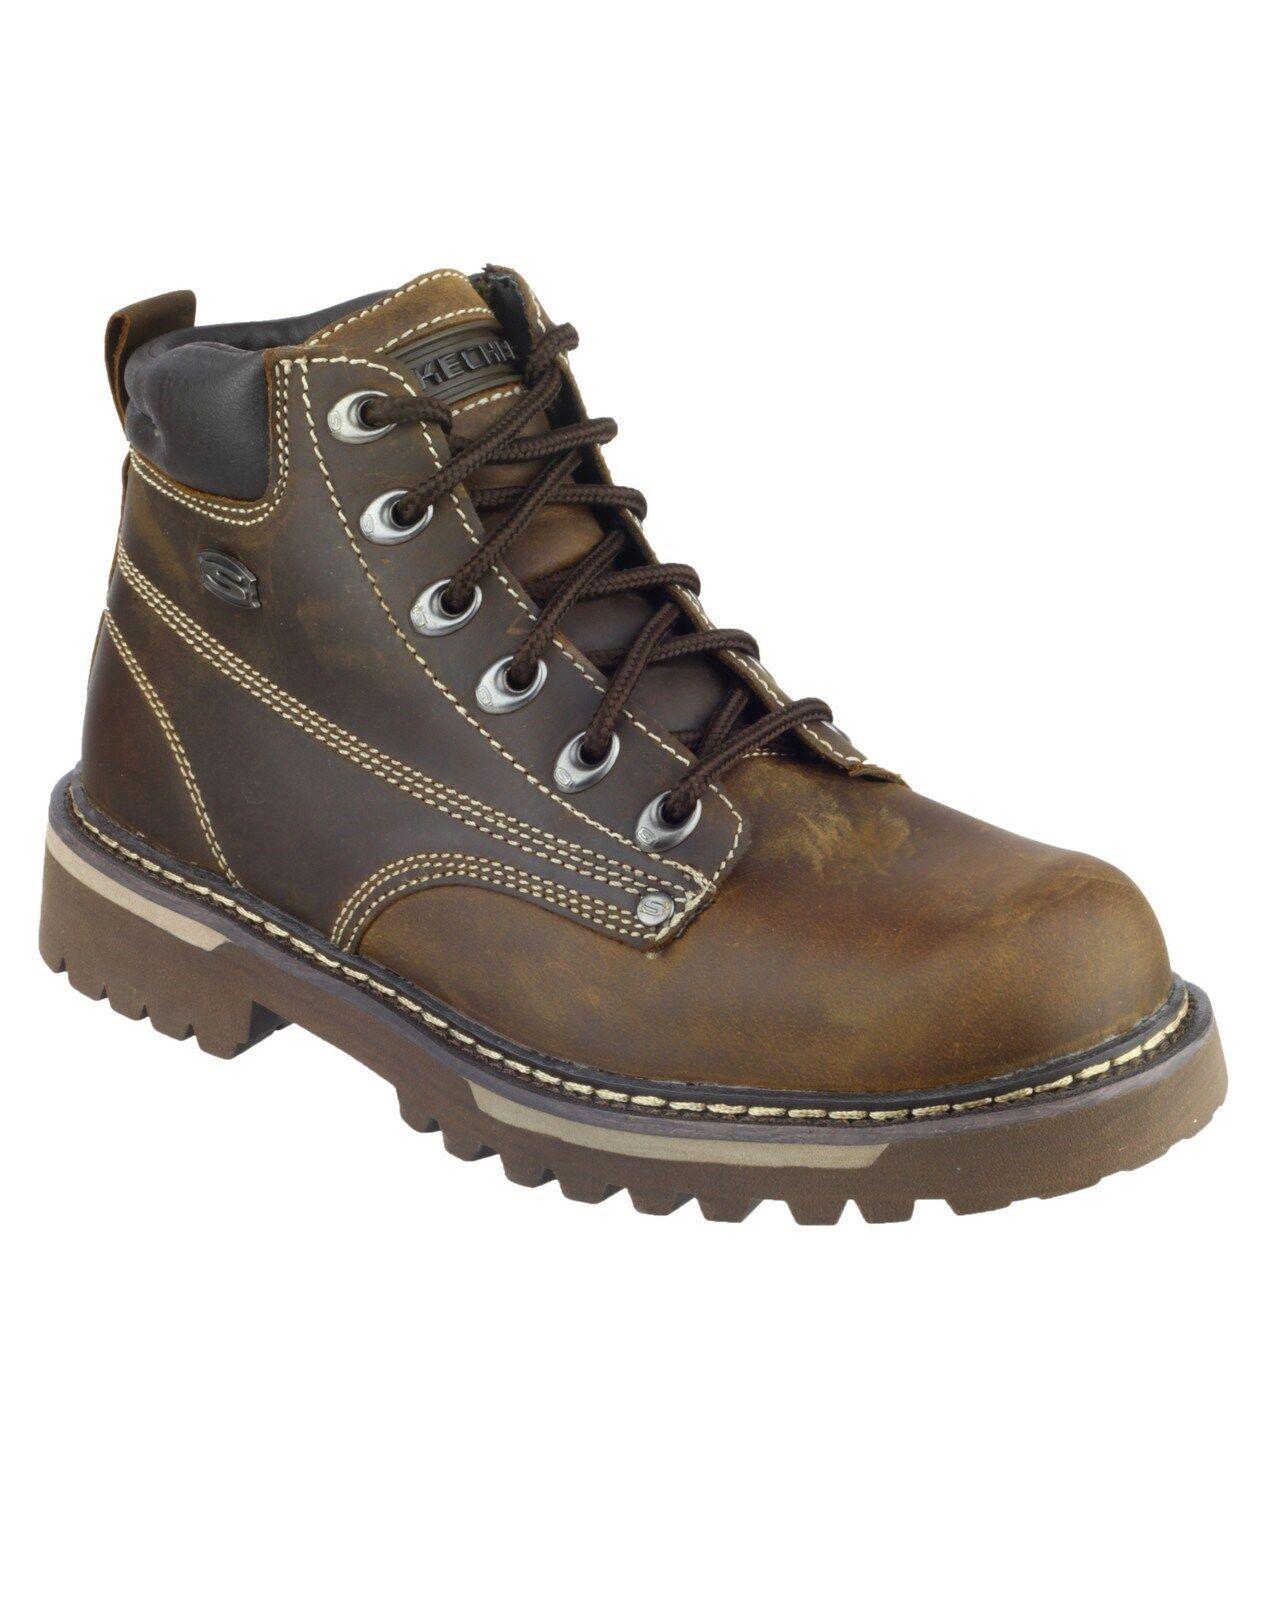 Skechers Cool Cat Bully II 2 hombre botas de marrones de botas piel sk4479 Zapatos uk6-12 f57a7e